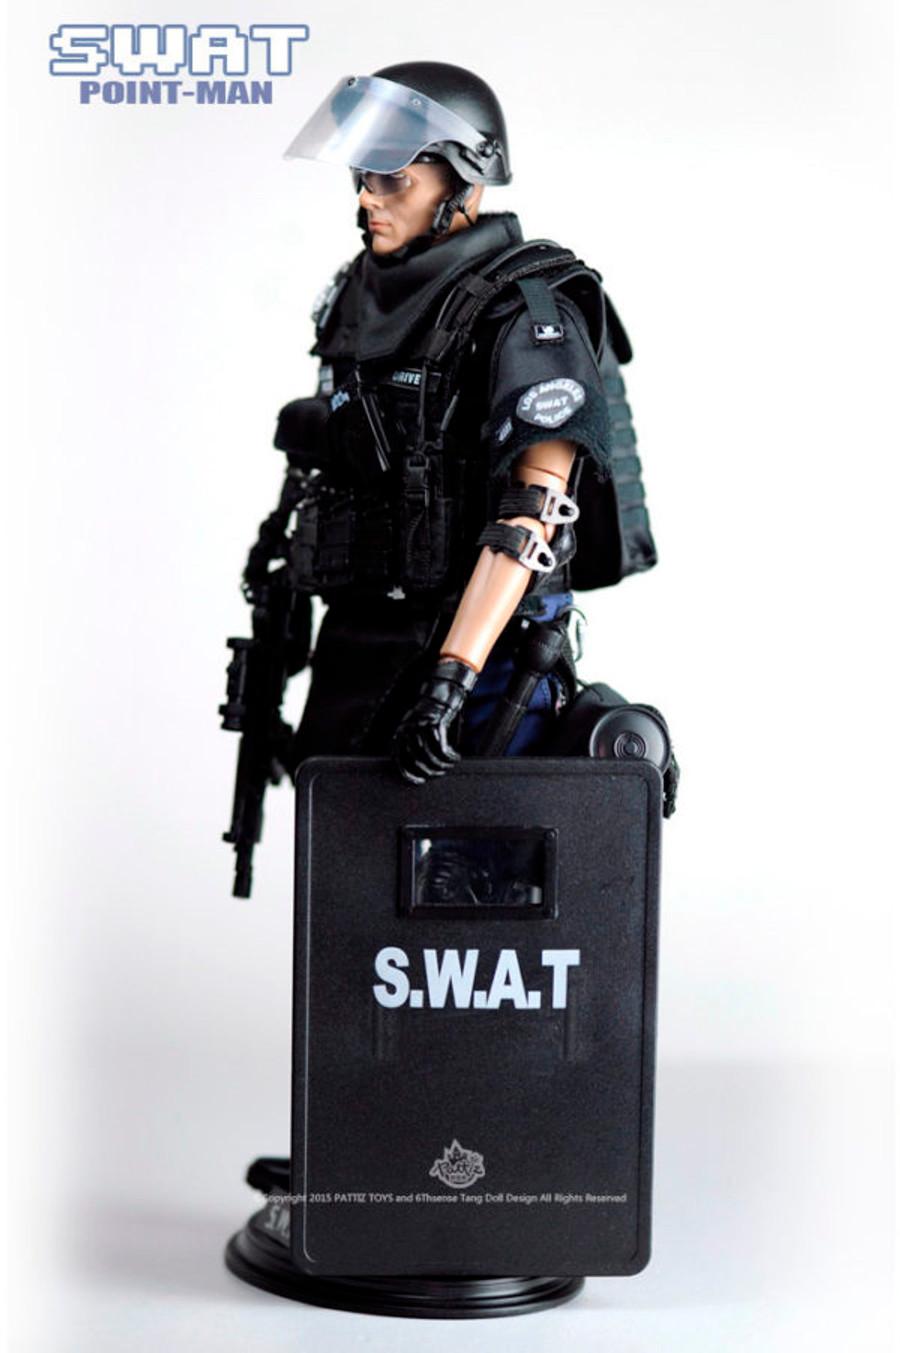 KADHOBBY - SWAT Point Man